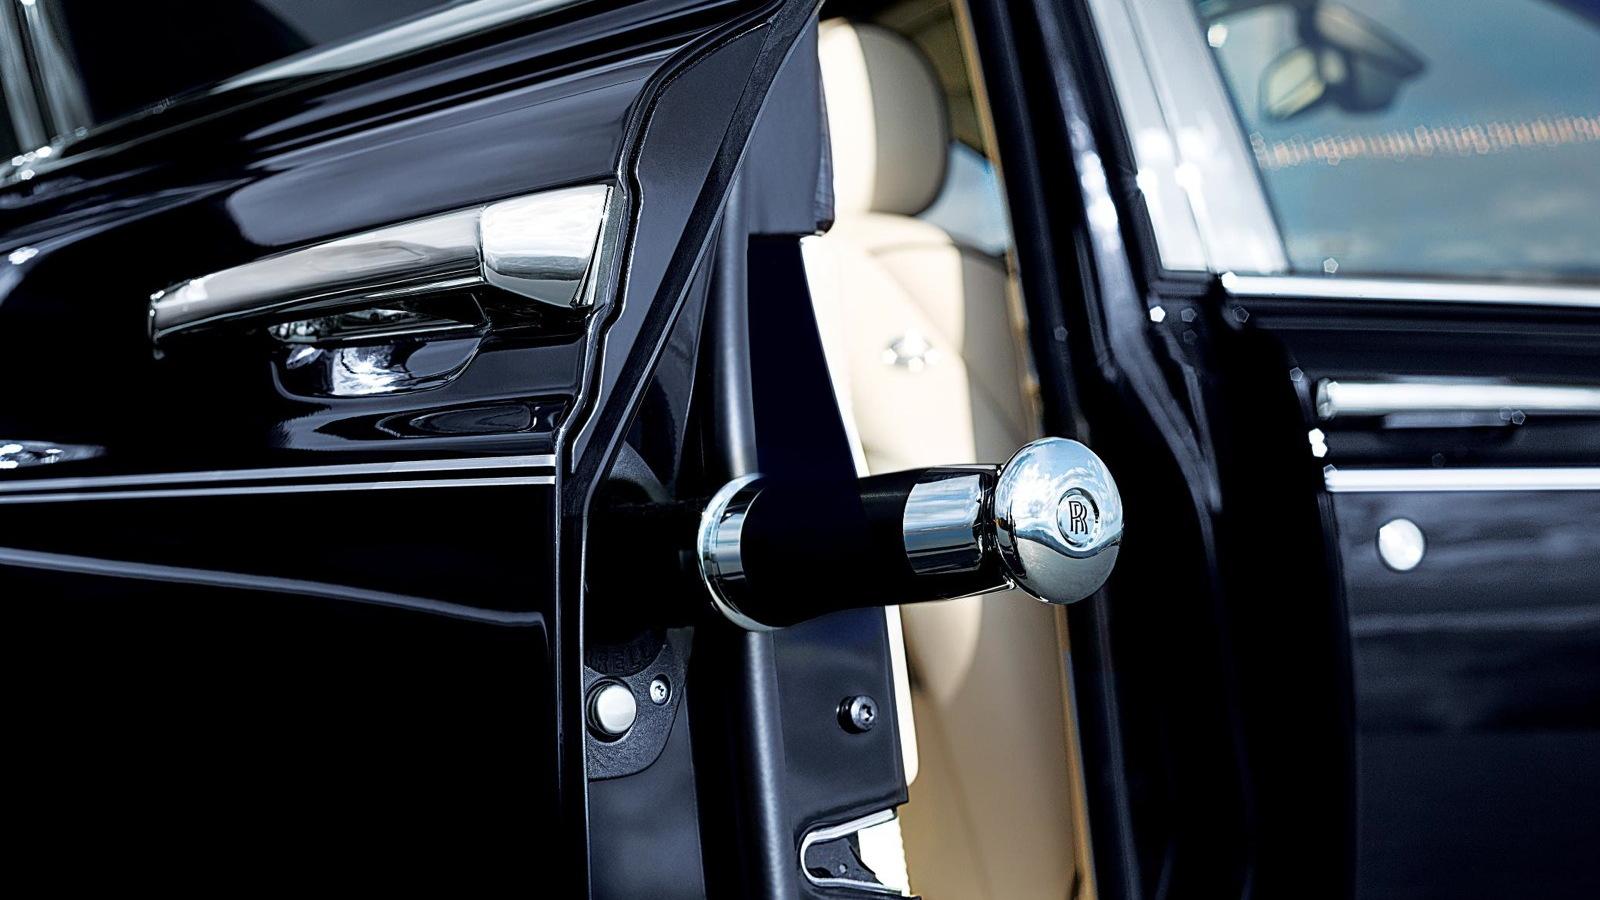 Rolls-Royce Series II Phantom Extended Wheelbase